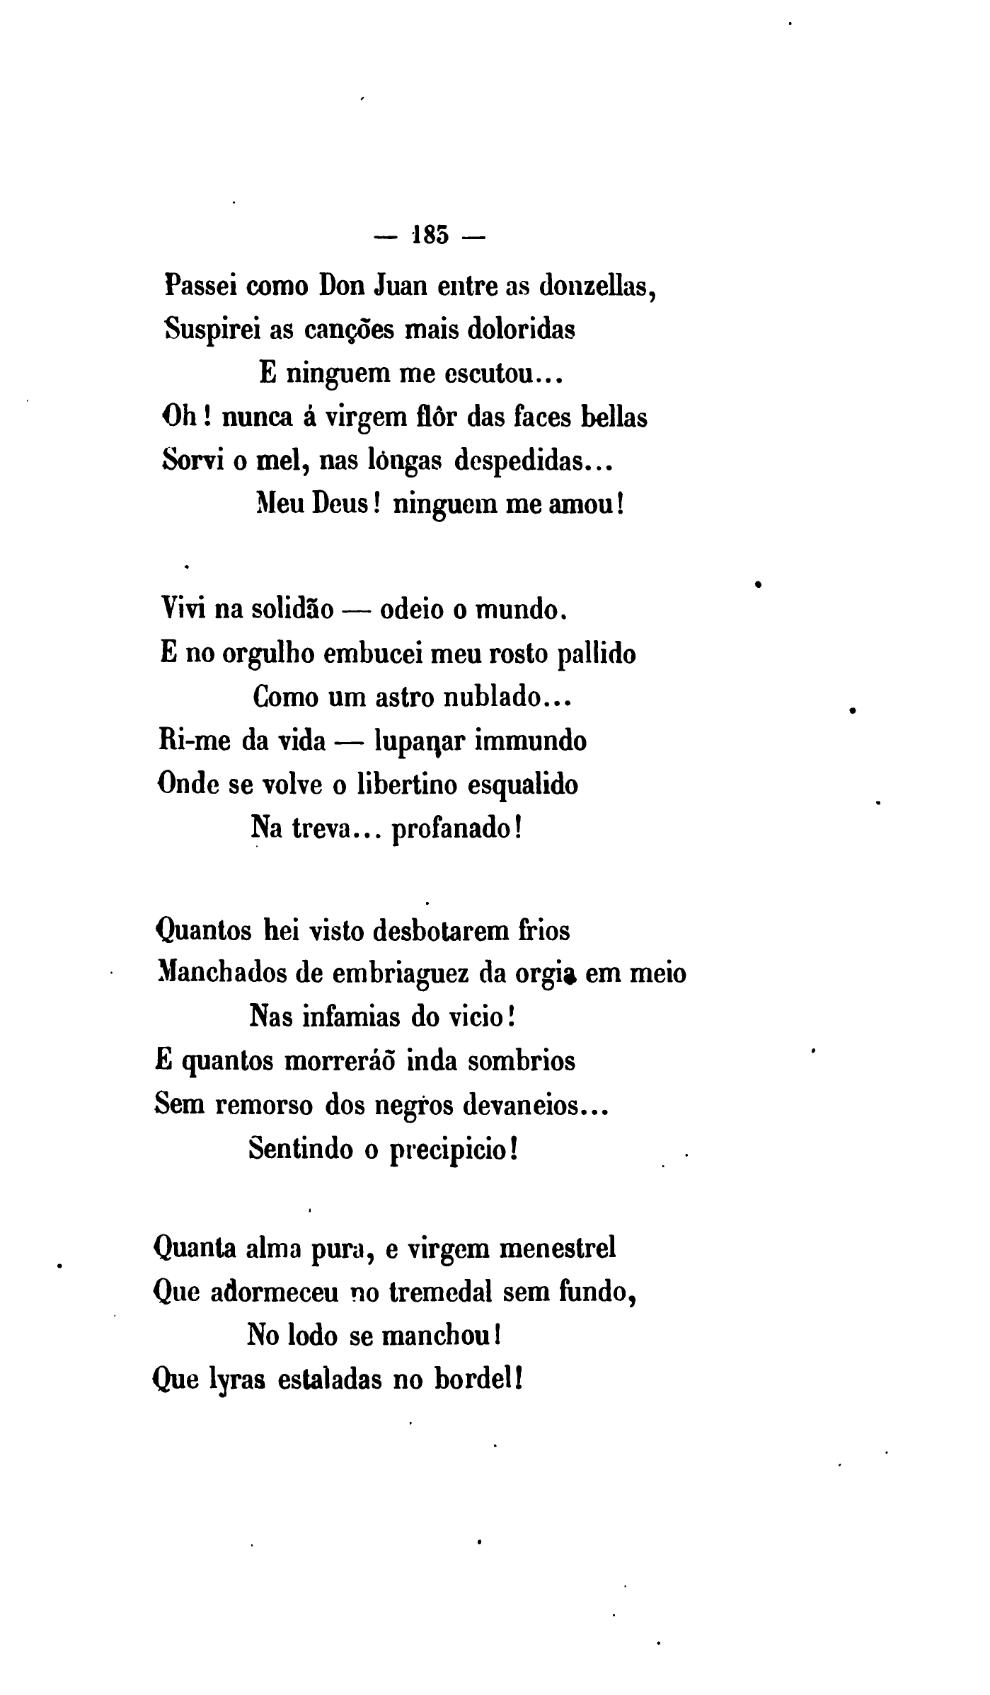 Pagina Obras De Manoel Antonio Alvares De Azevedo V1 Djvu 193